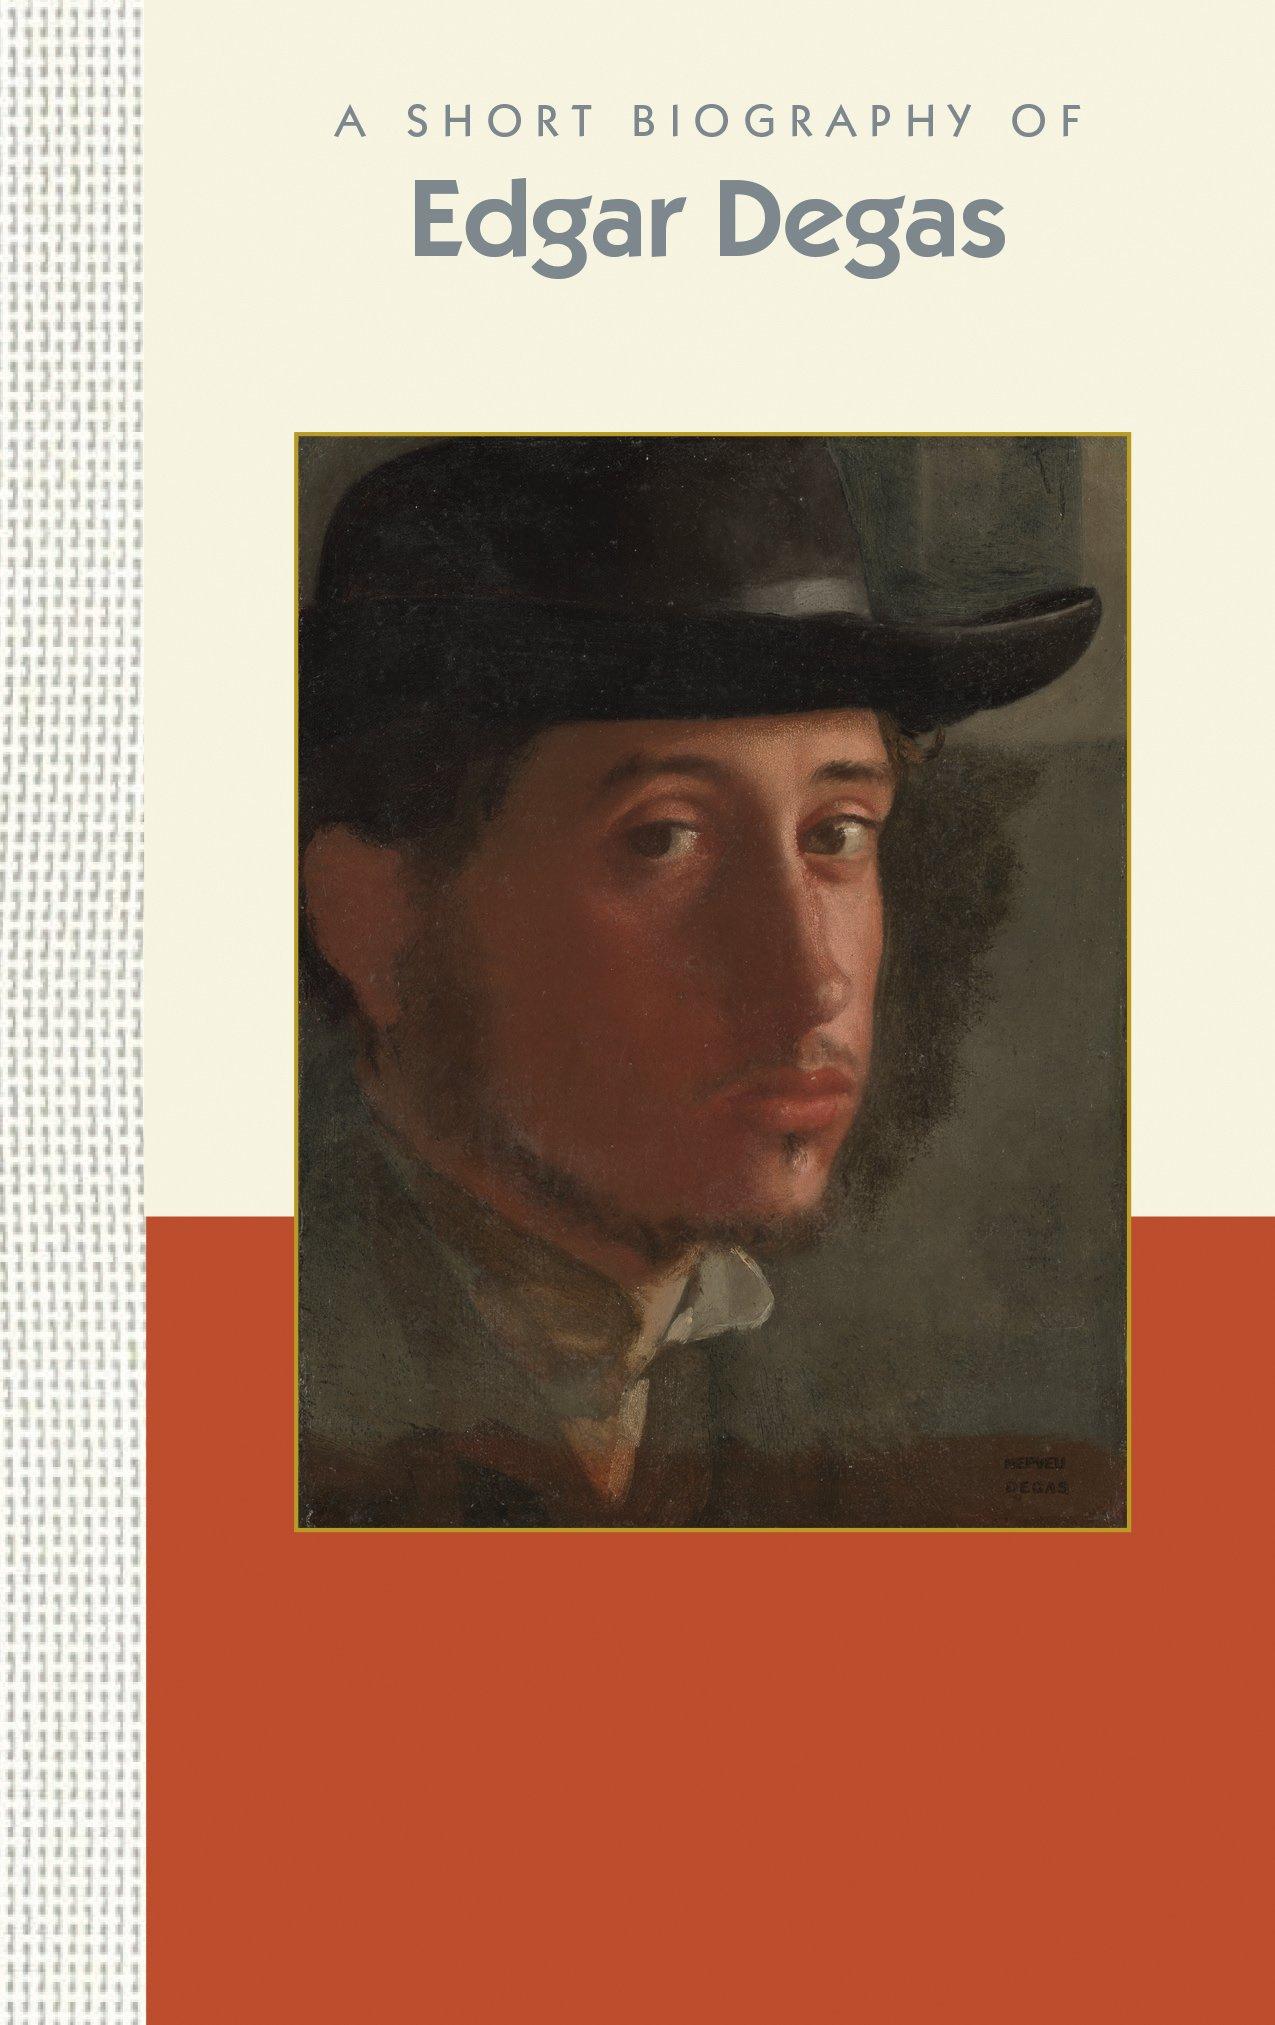 A Short Biography of Edgar Degas